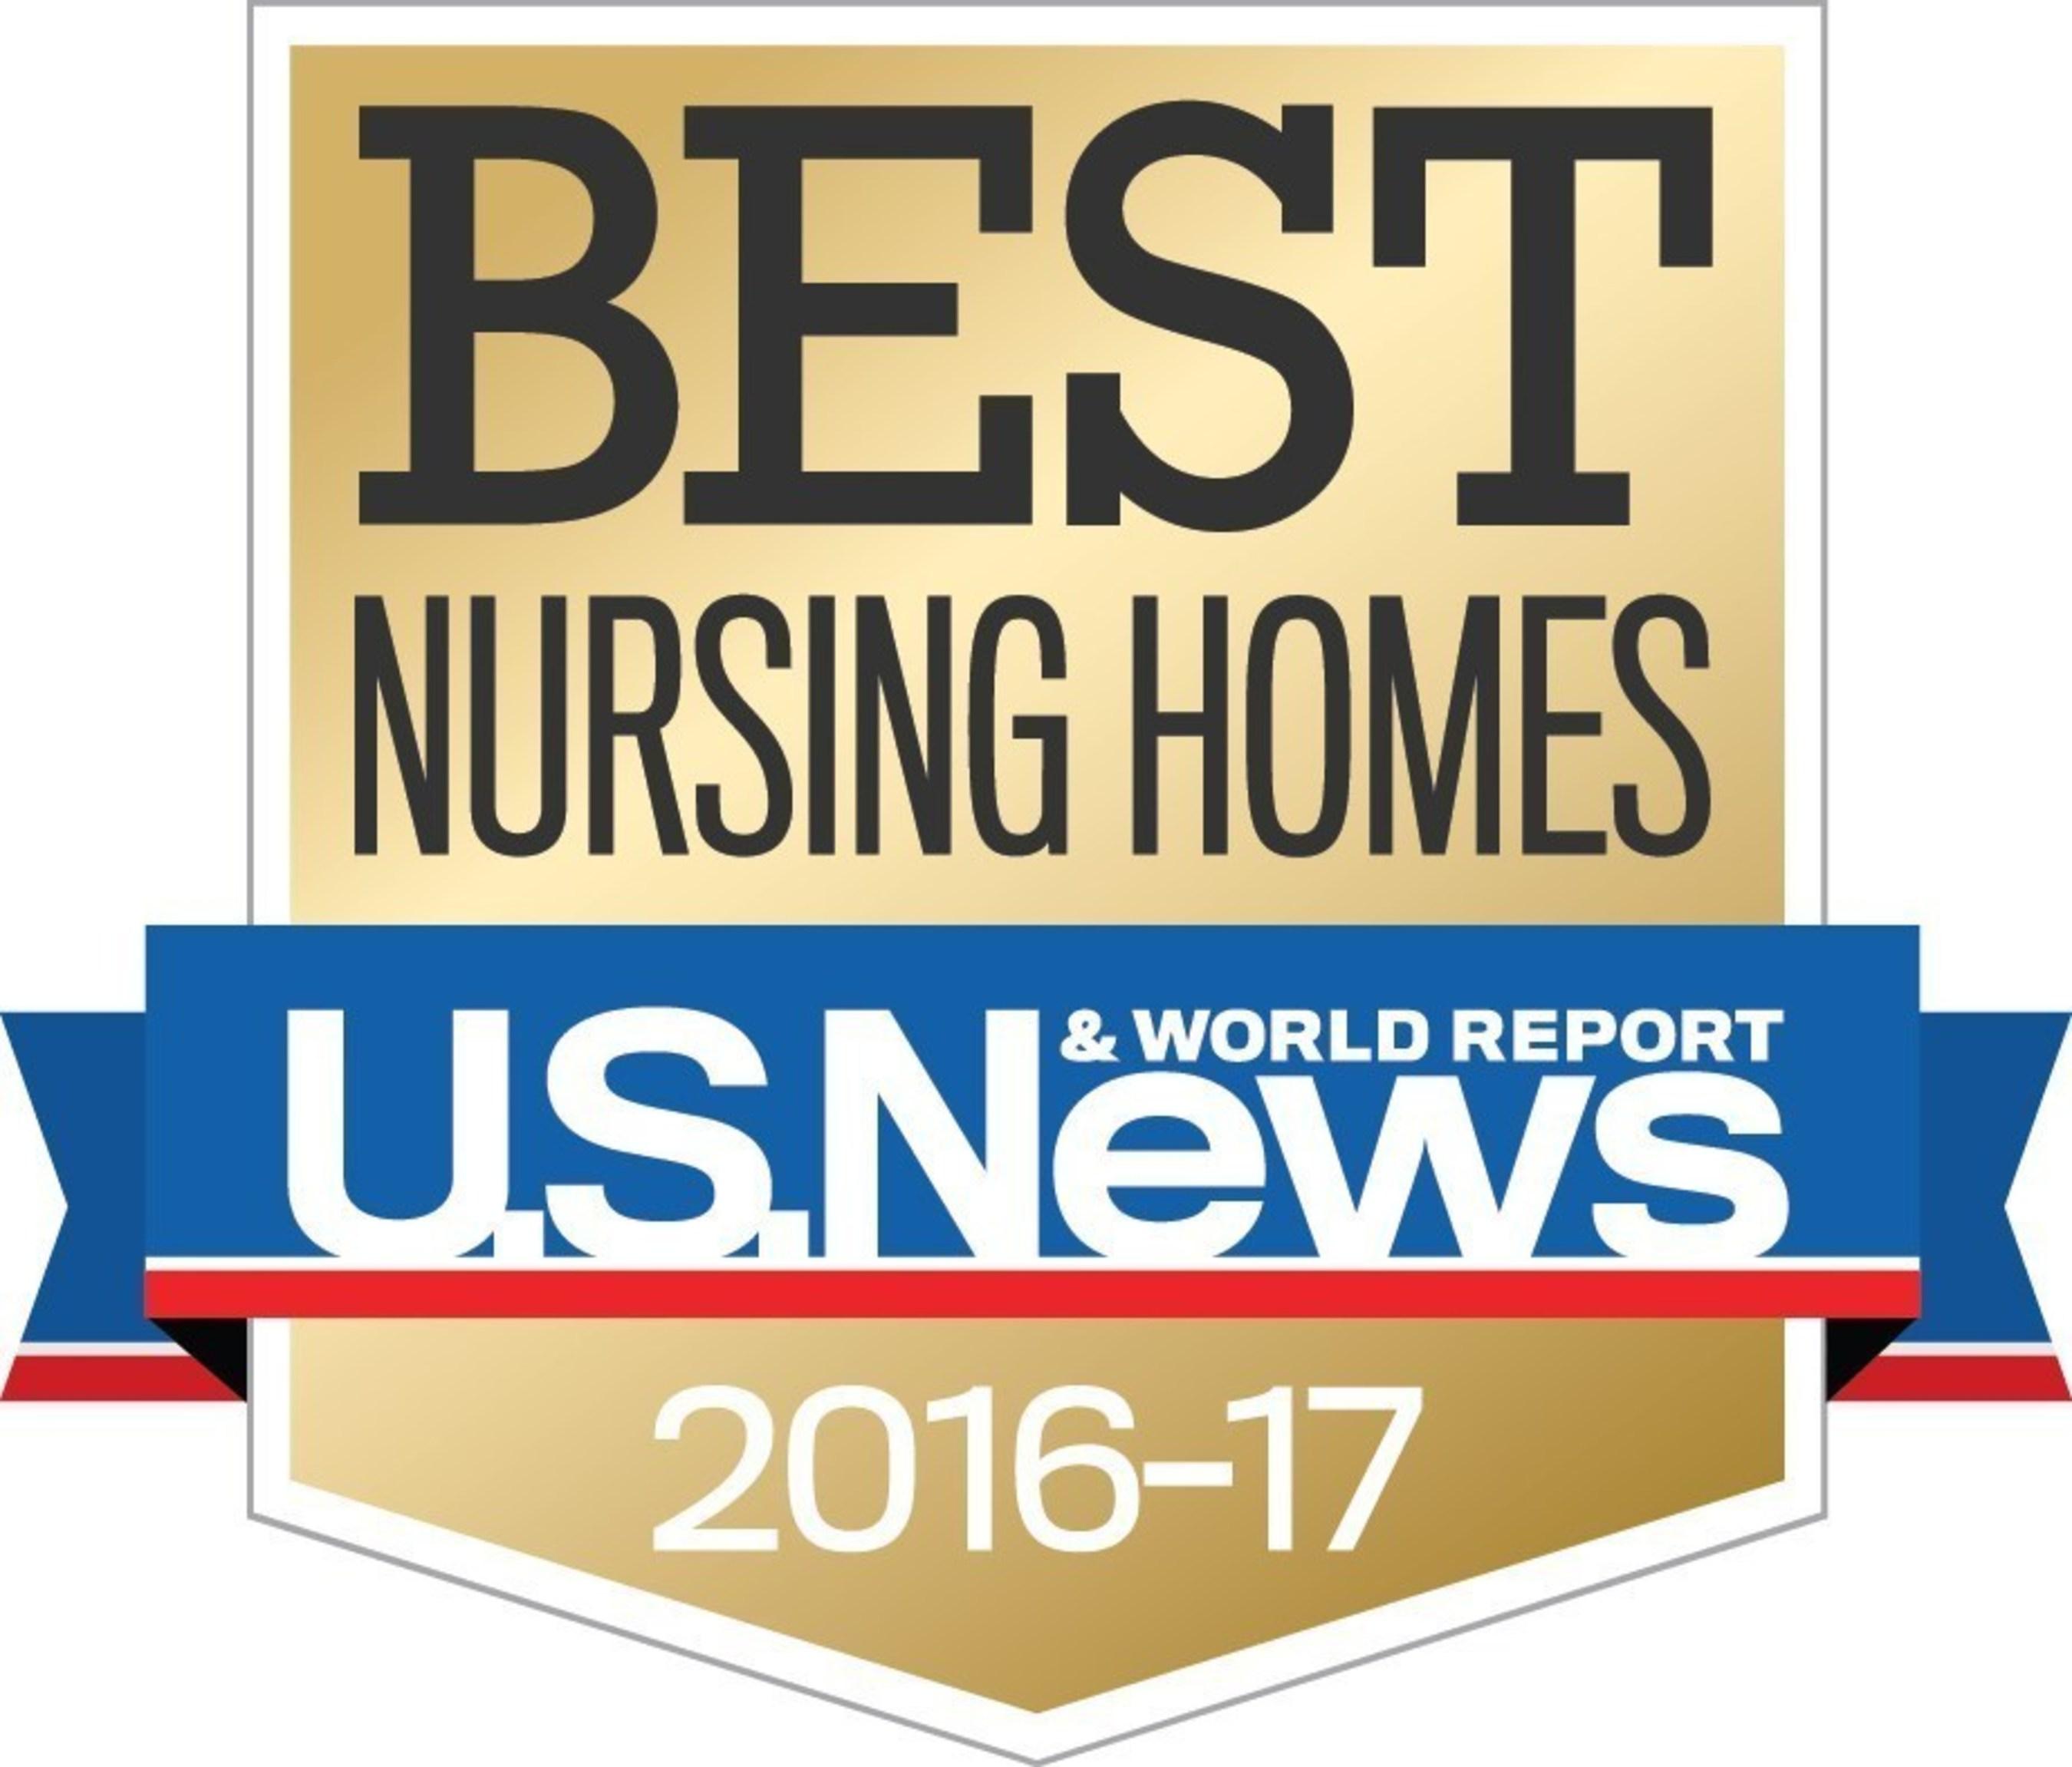 10 PruittHealth centers rank among U.S. News & World Report's Best Nursing Homes list for 2016-17.